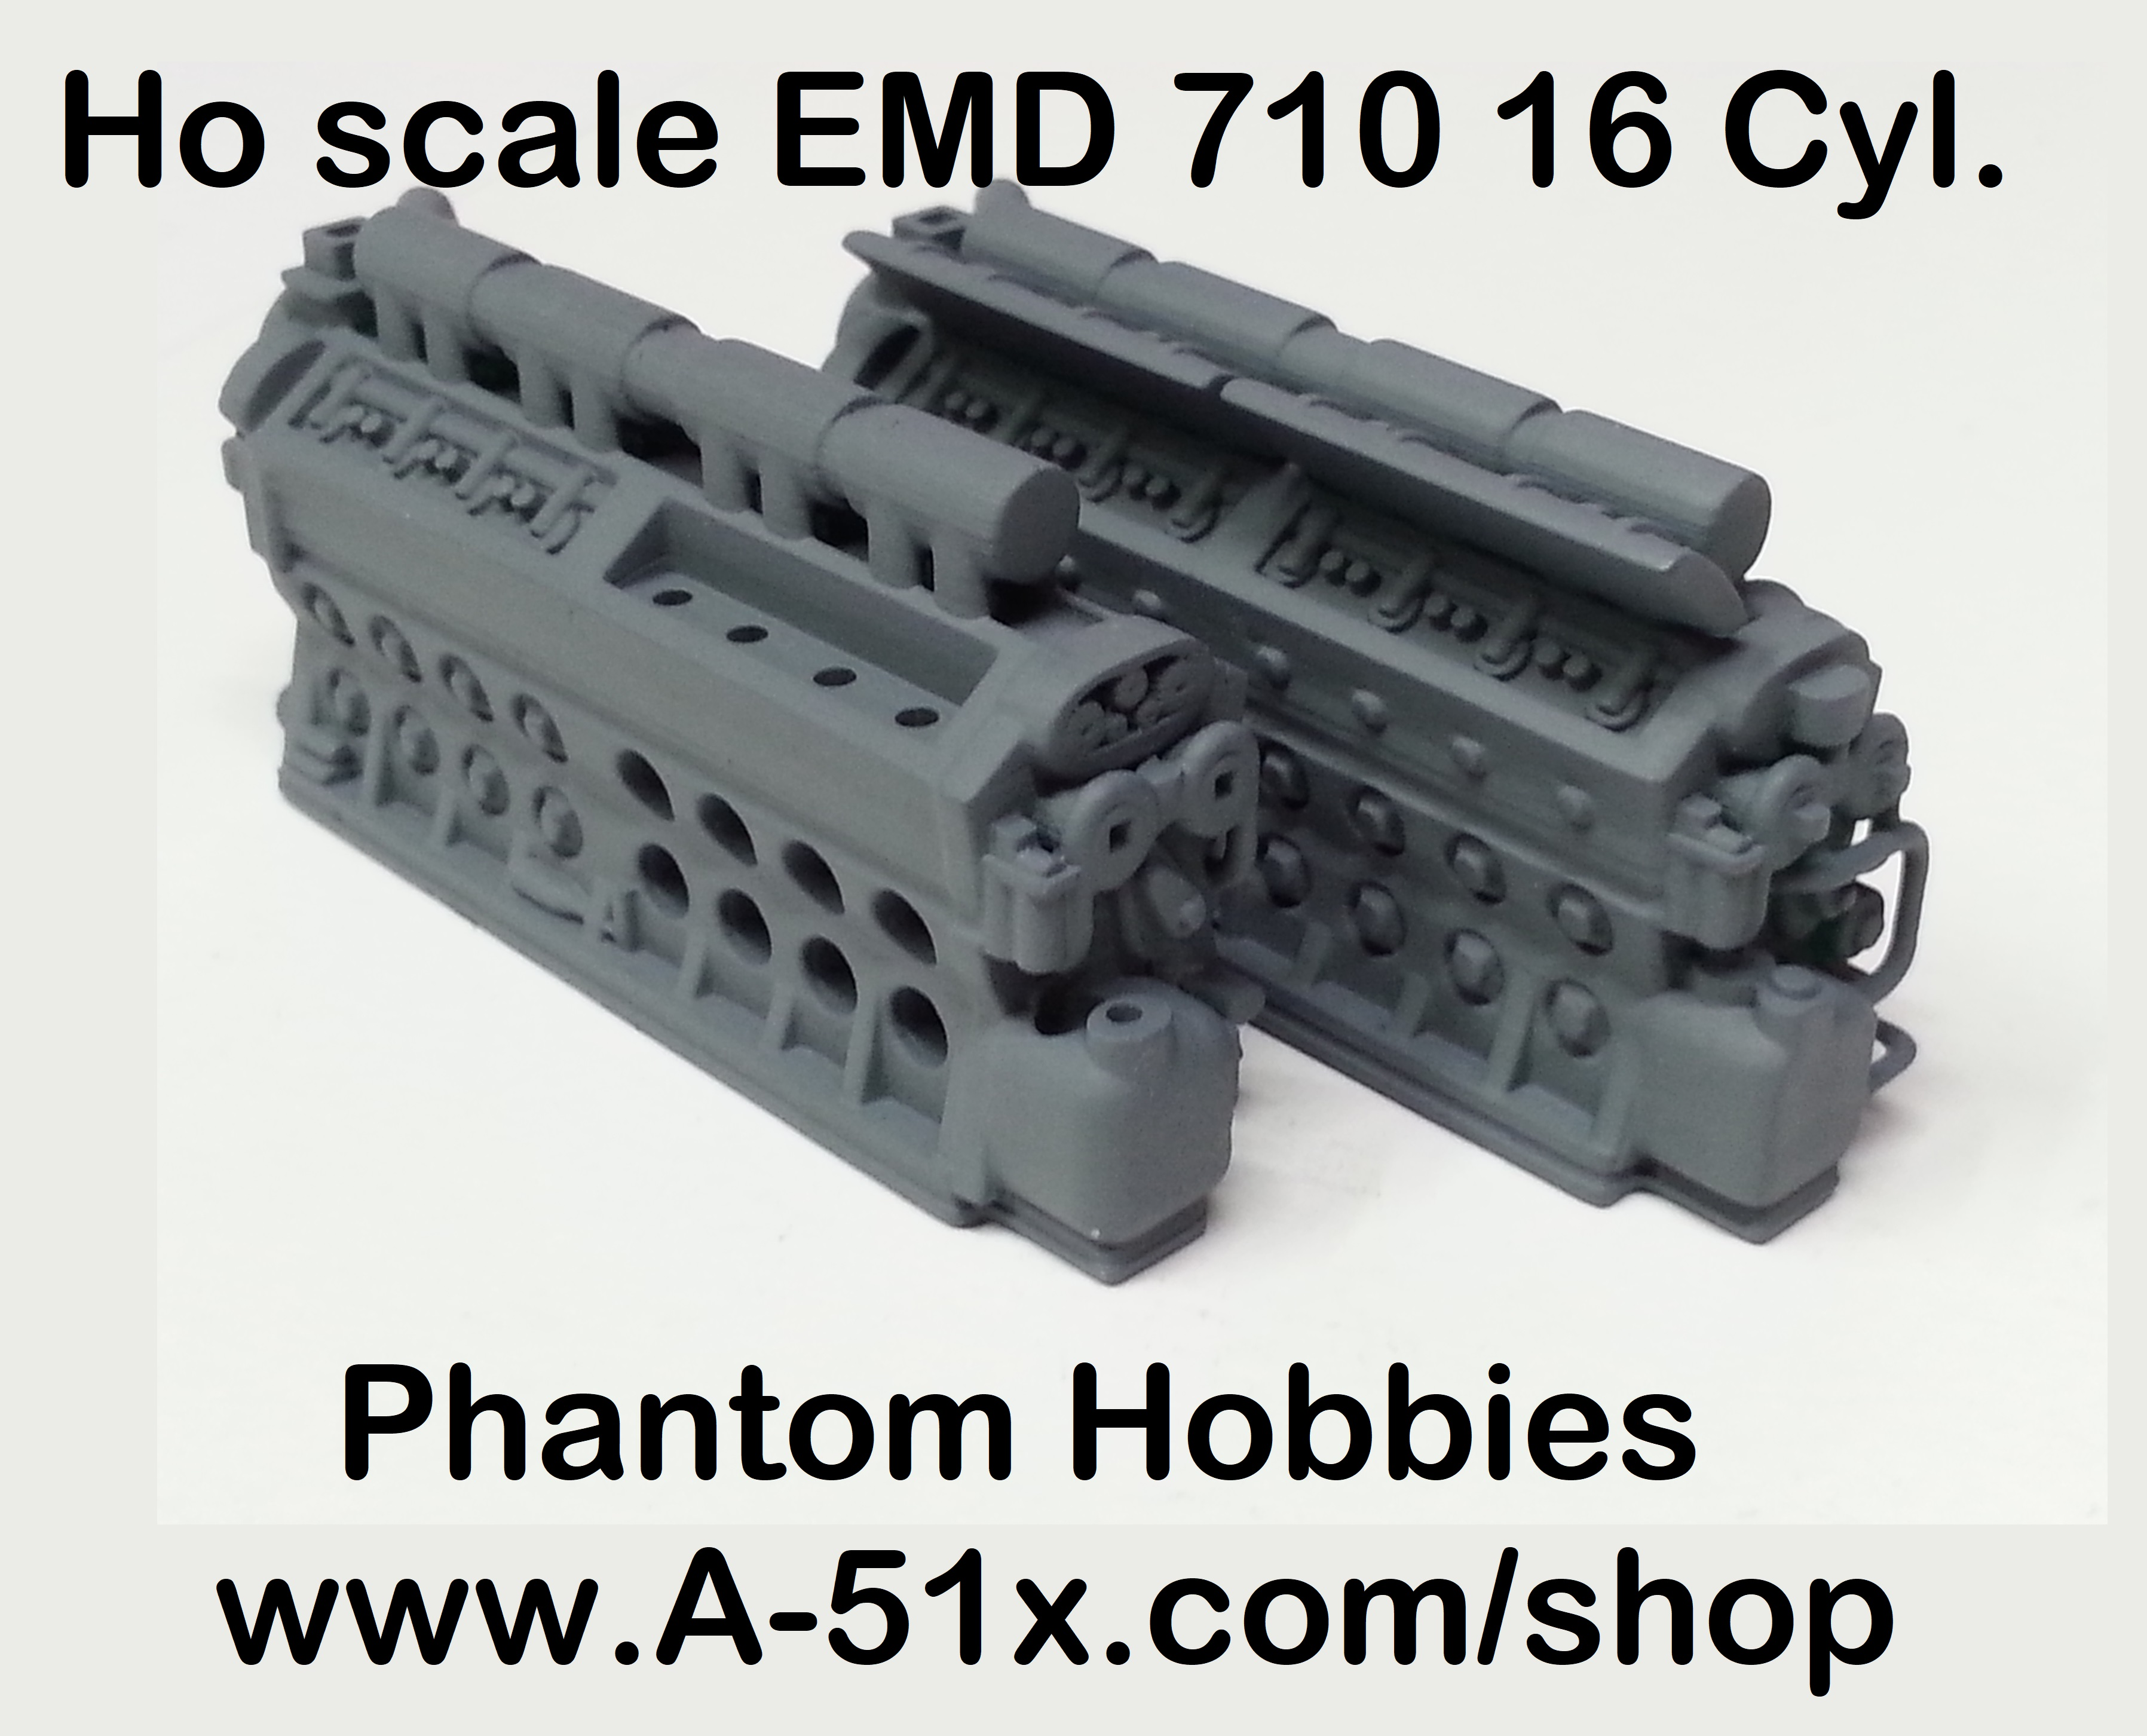 Ho scale EMD 710 16 Cyl.